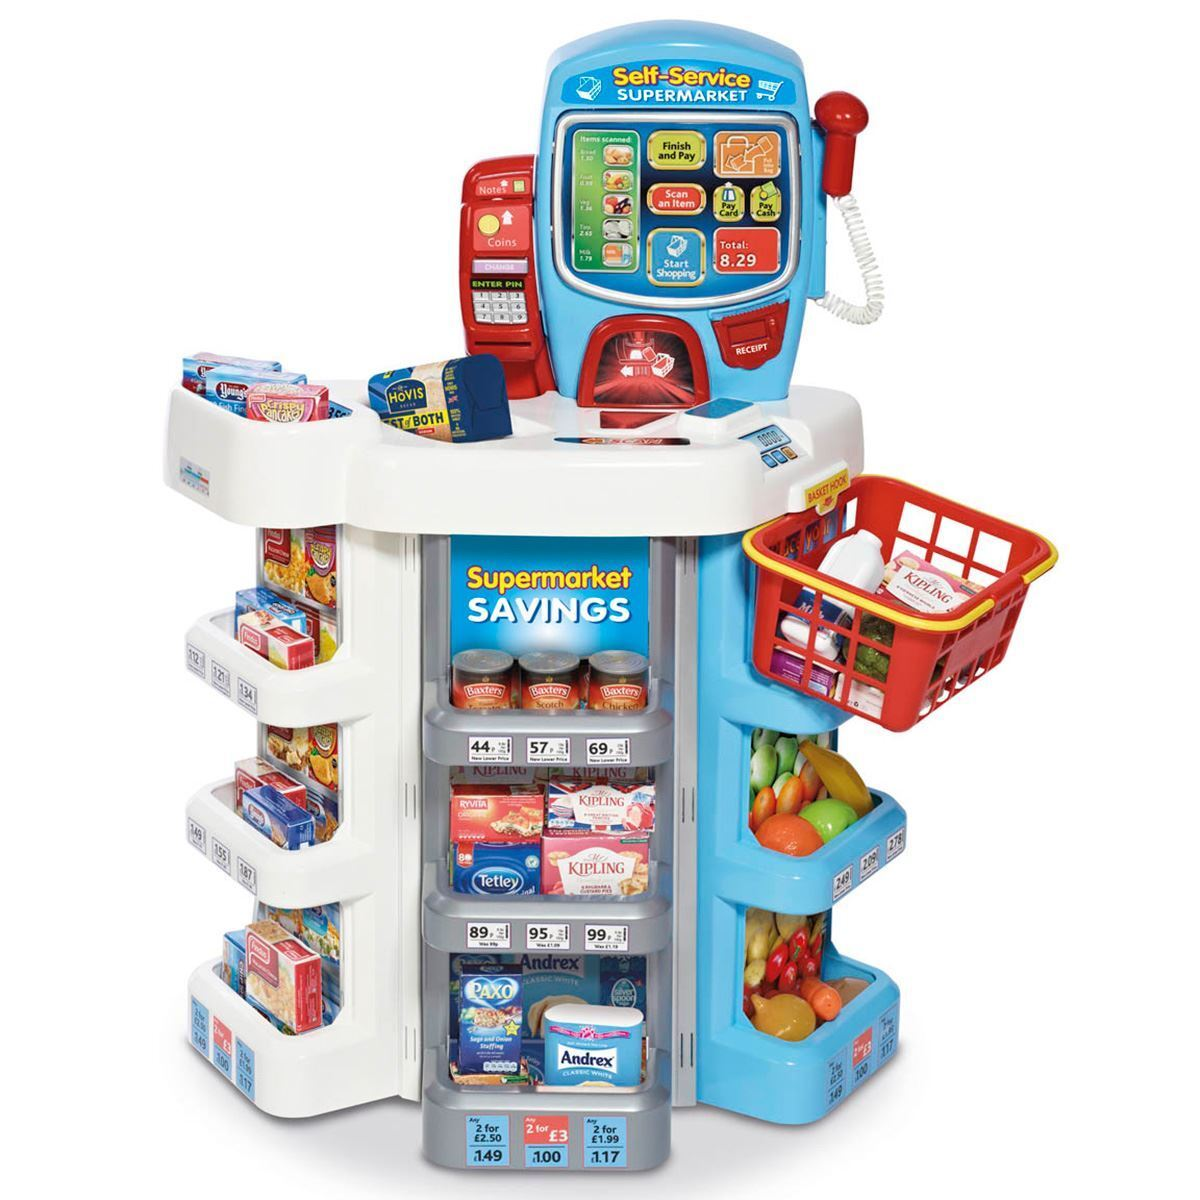 Infantil Permite Supermercado Set de Compras Kit Pantalla Táctil Escáner Cesta